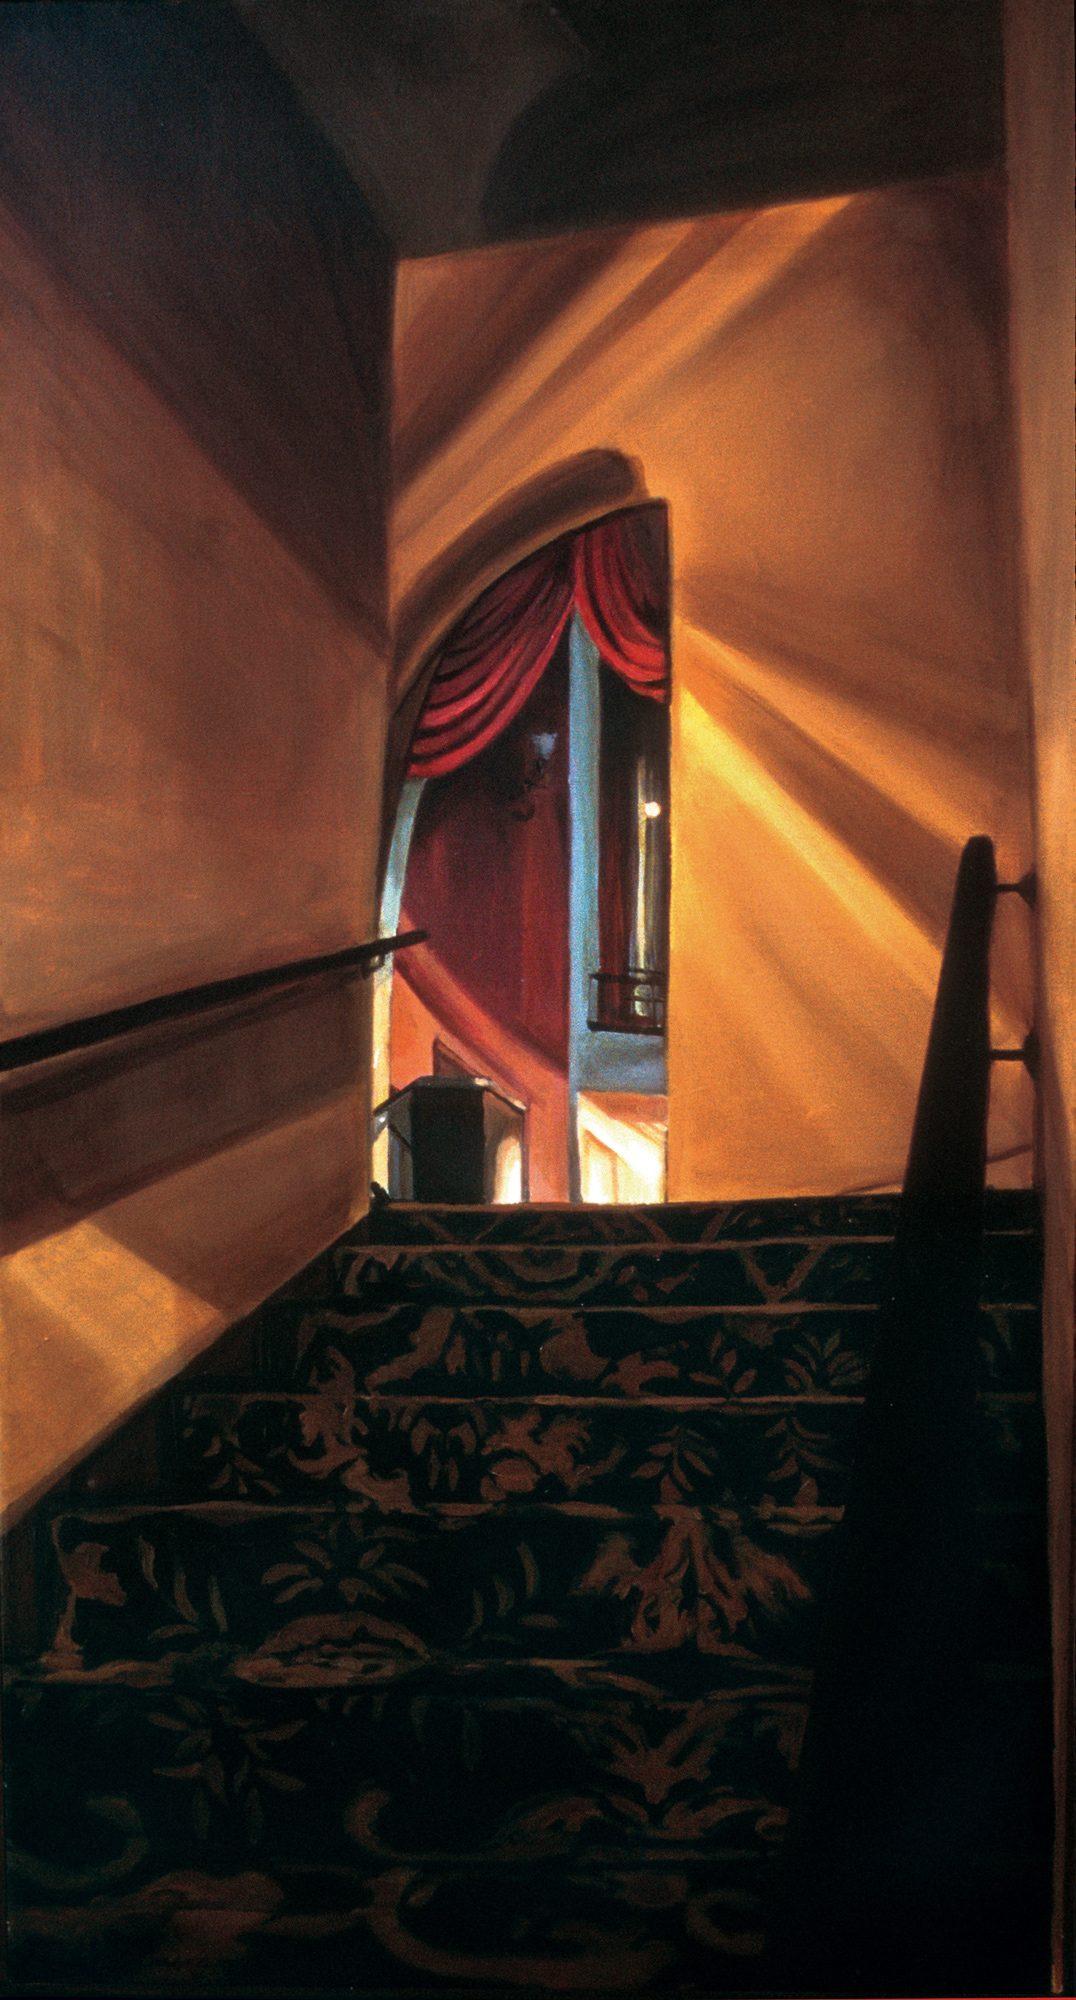 Entering The Balcony